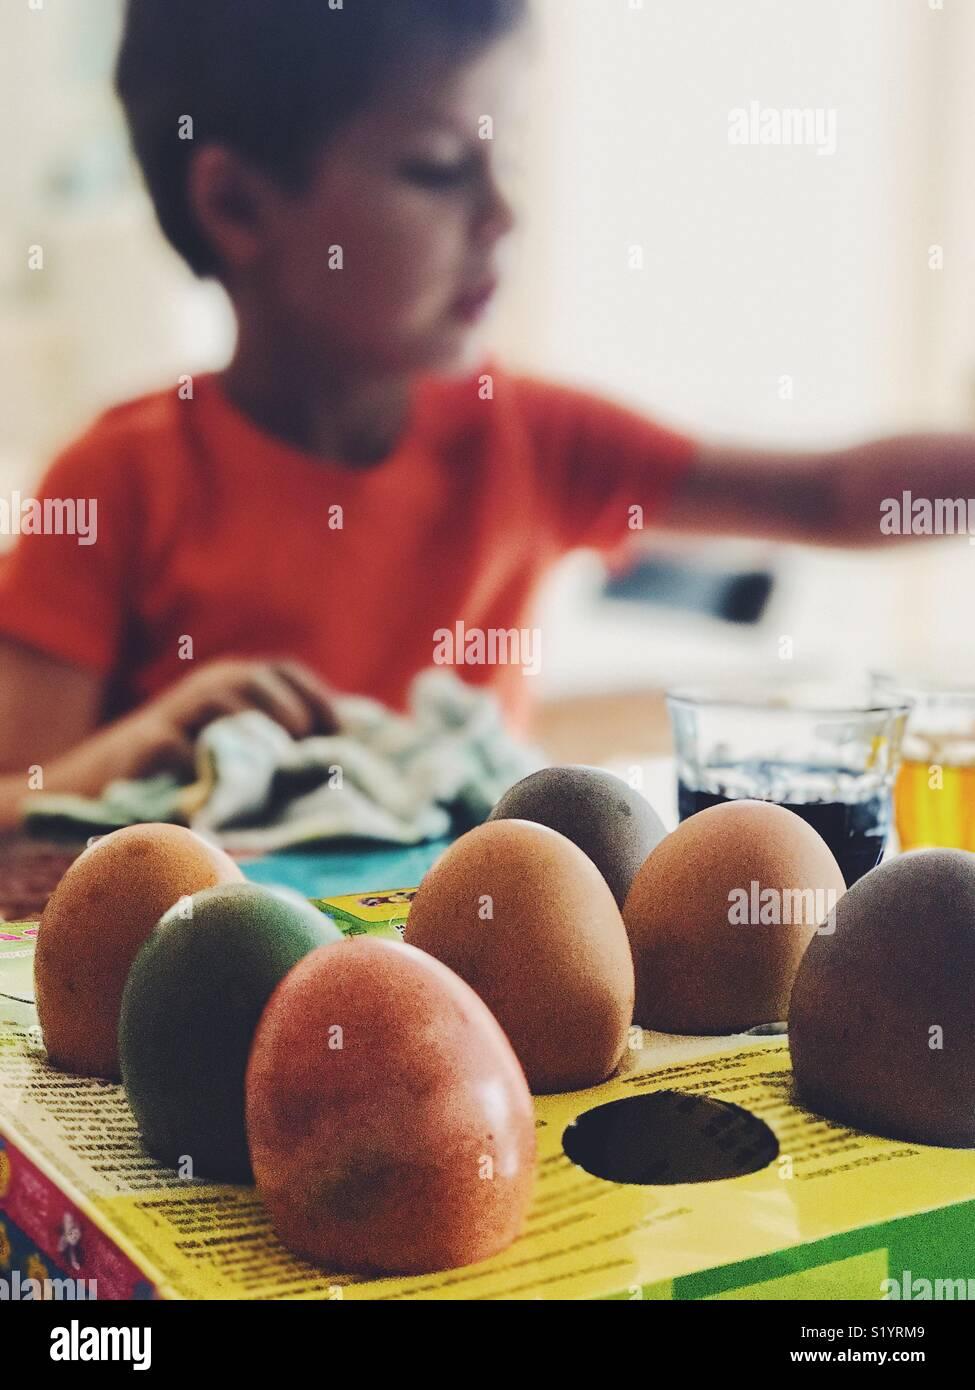 Easter eggs - Stock Image